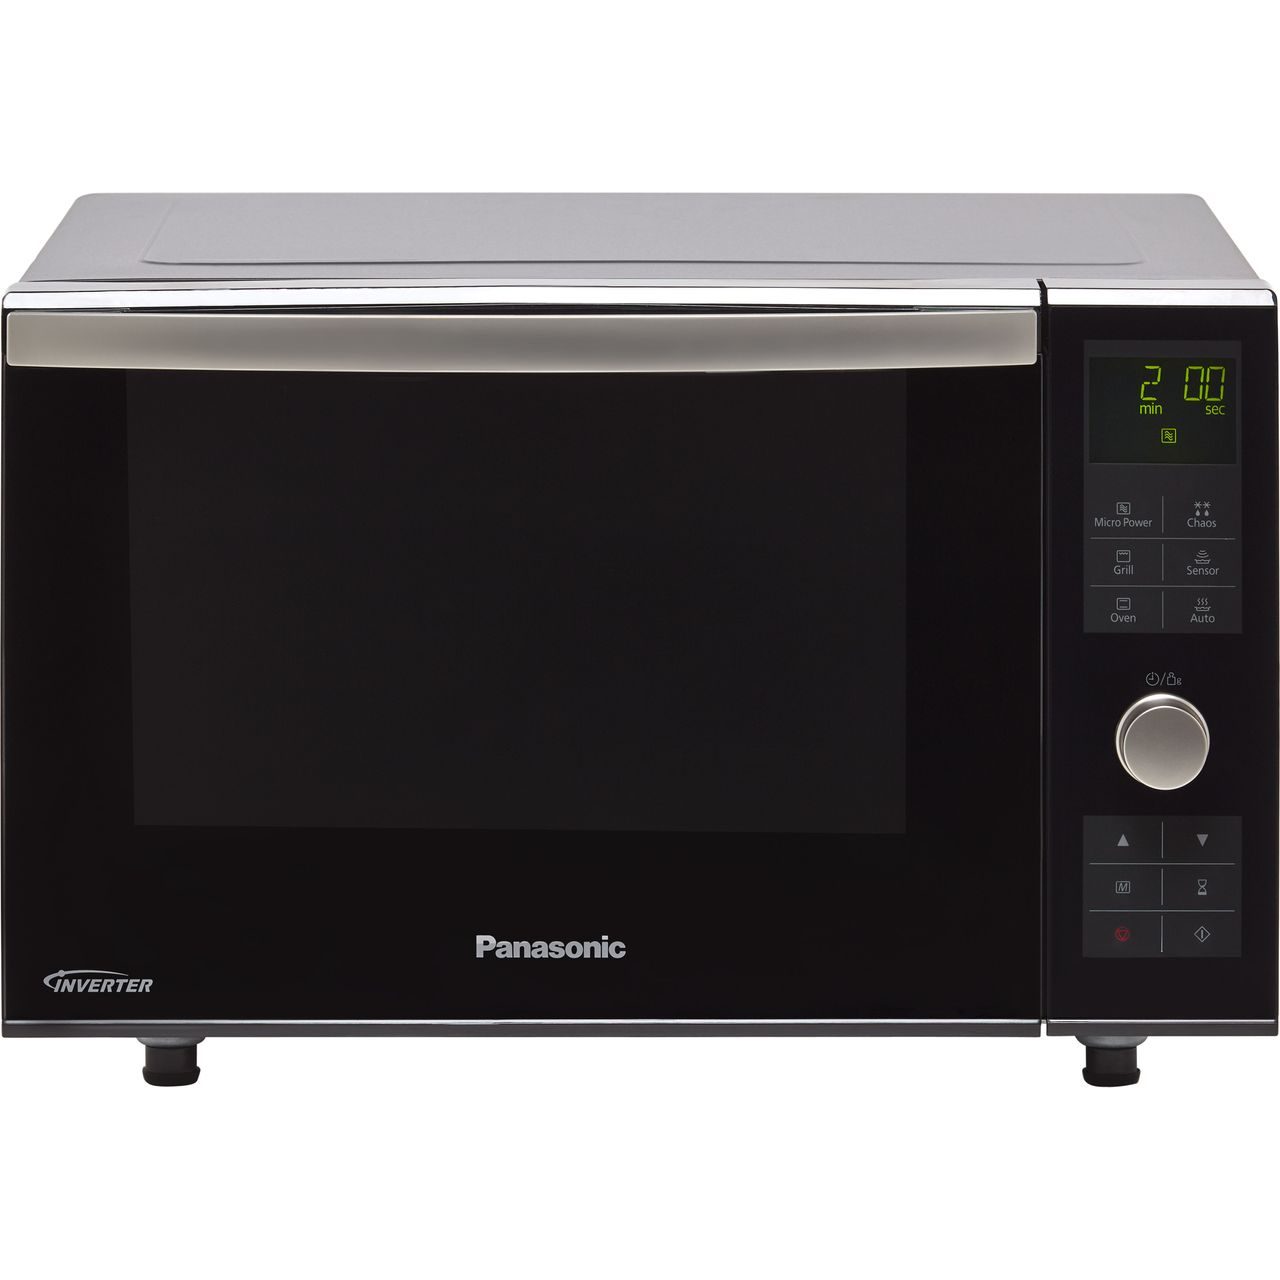 Panasonic Microwave Main Image Panasonic Convection